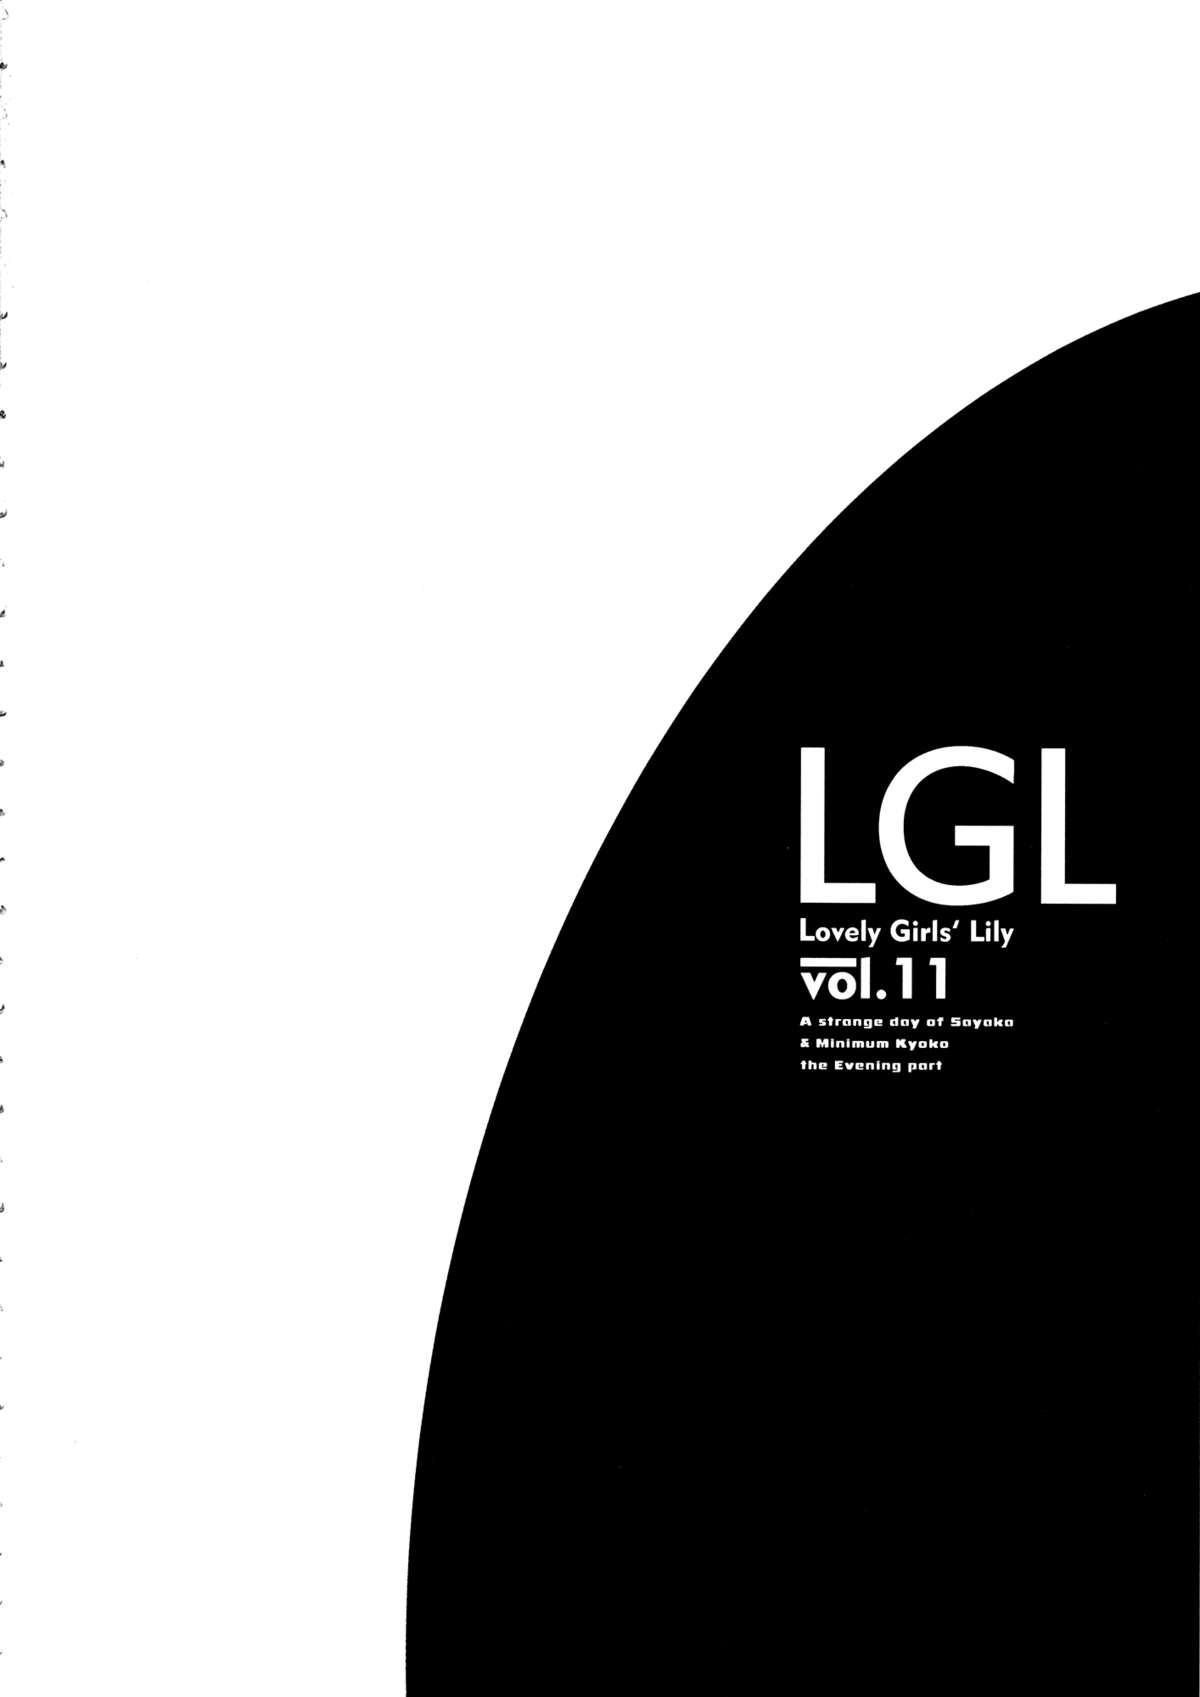 Lovely Girls' Lily Vol. 11 2